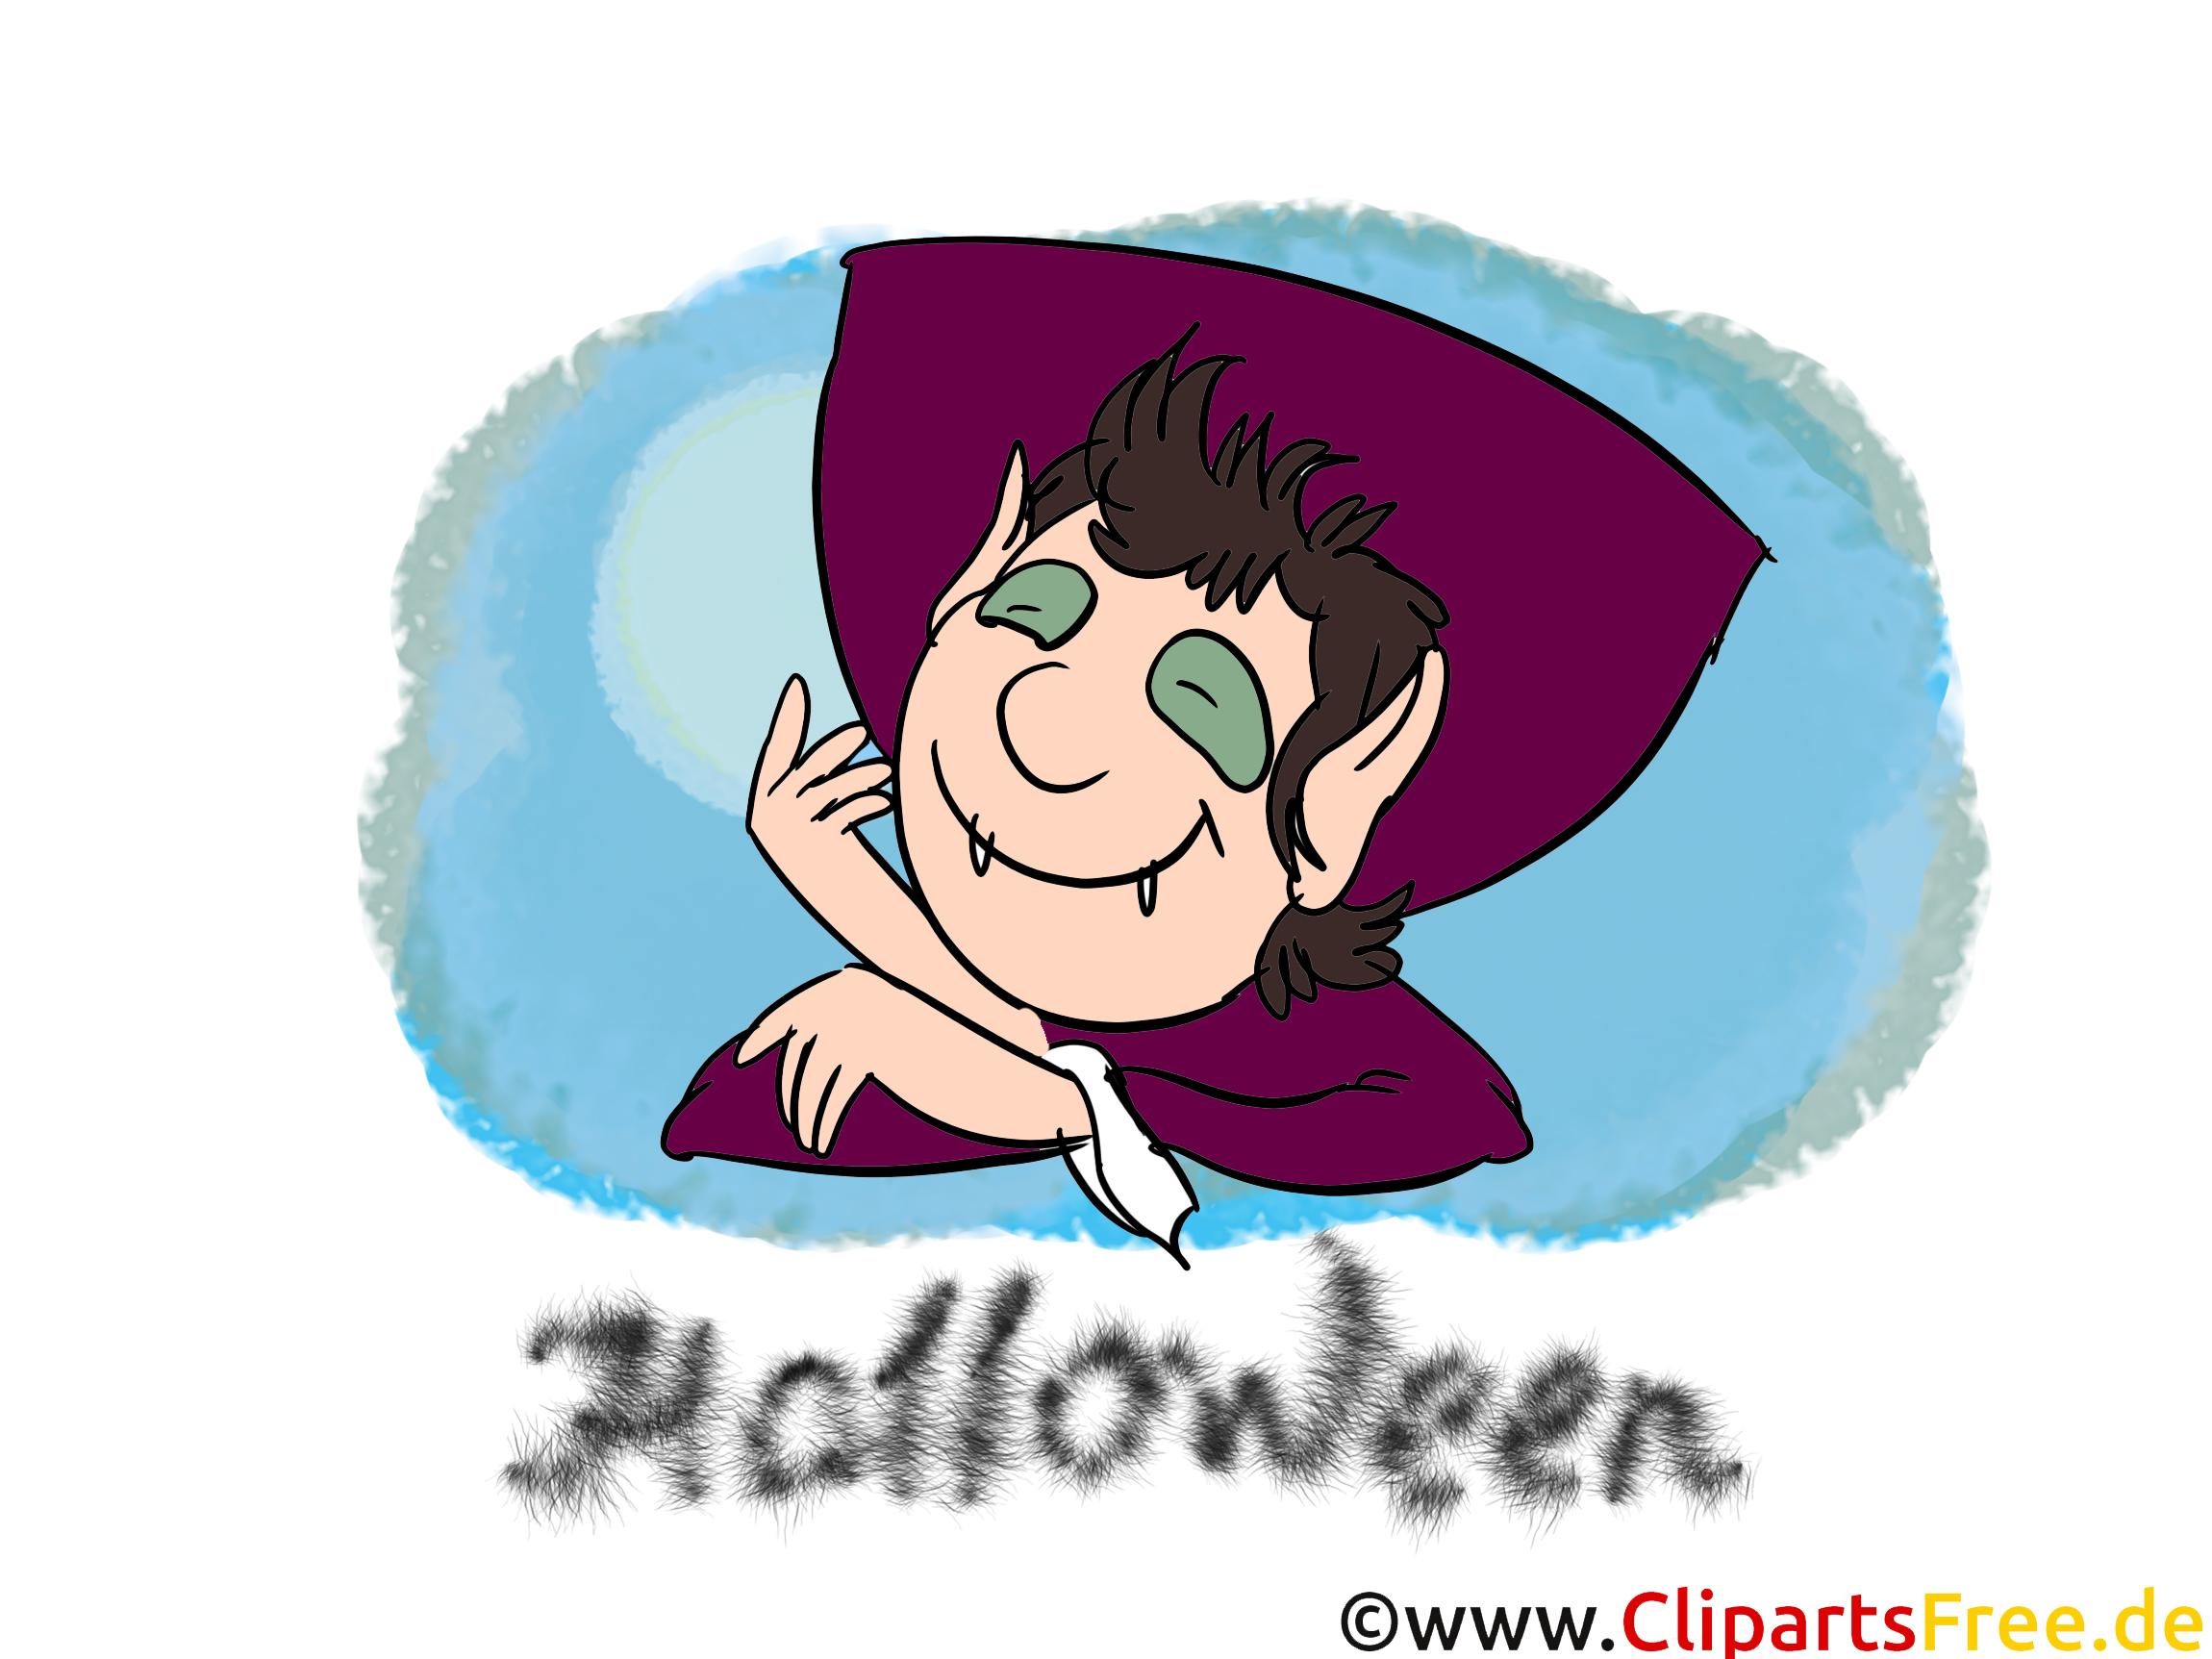 Vampire image gratuite - Halloween illustration